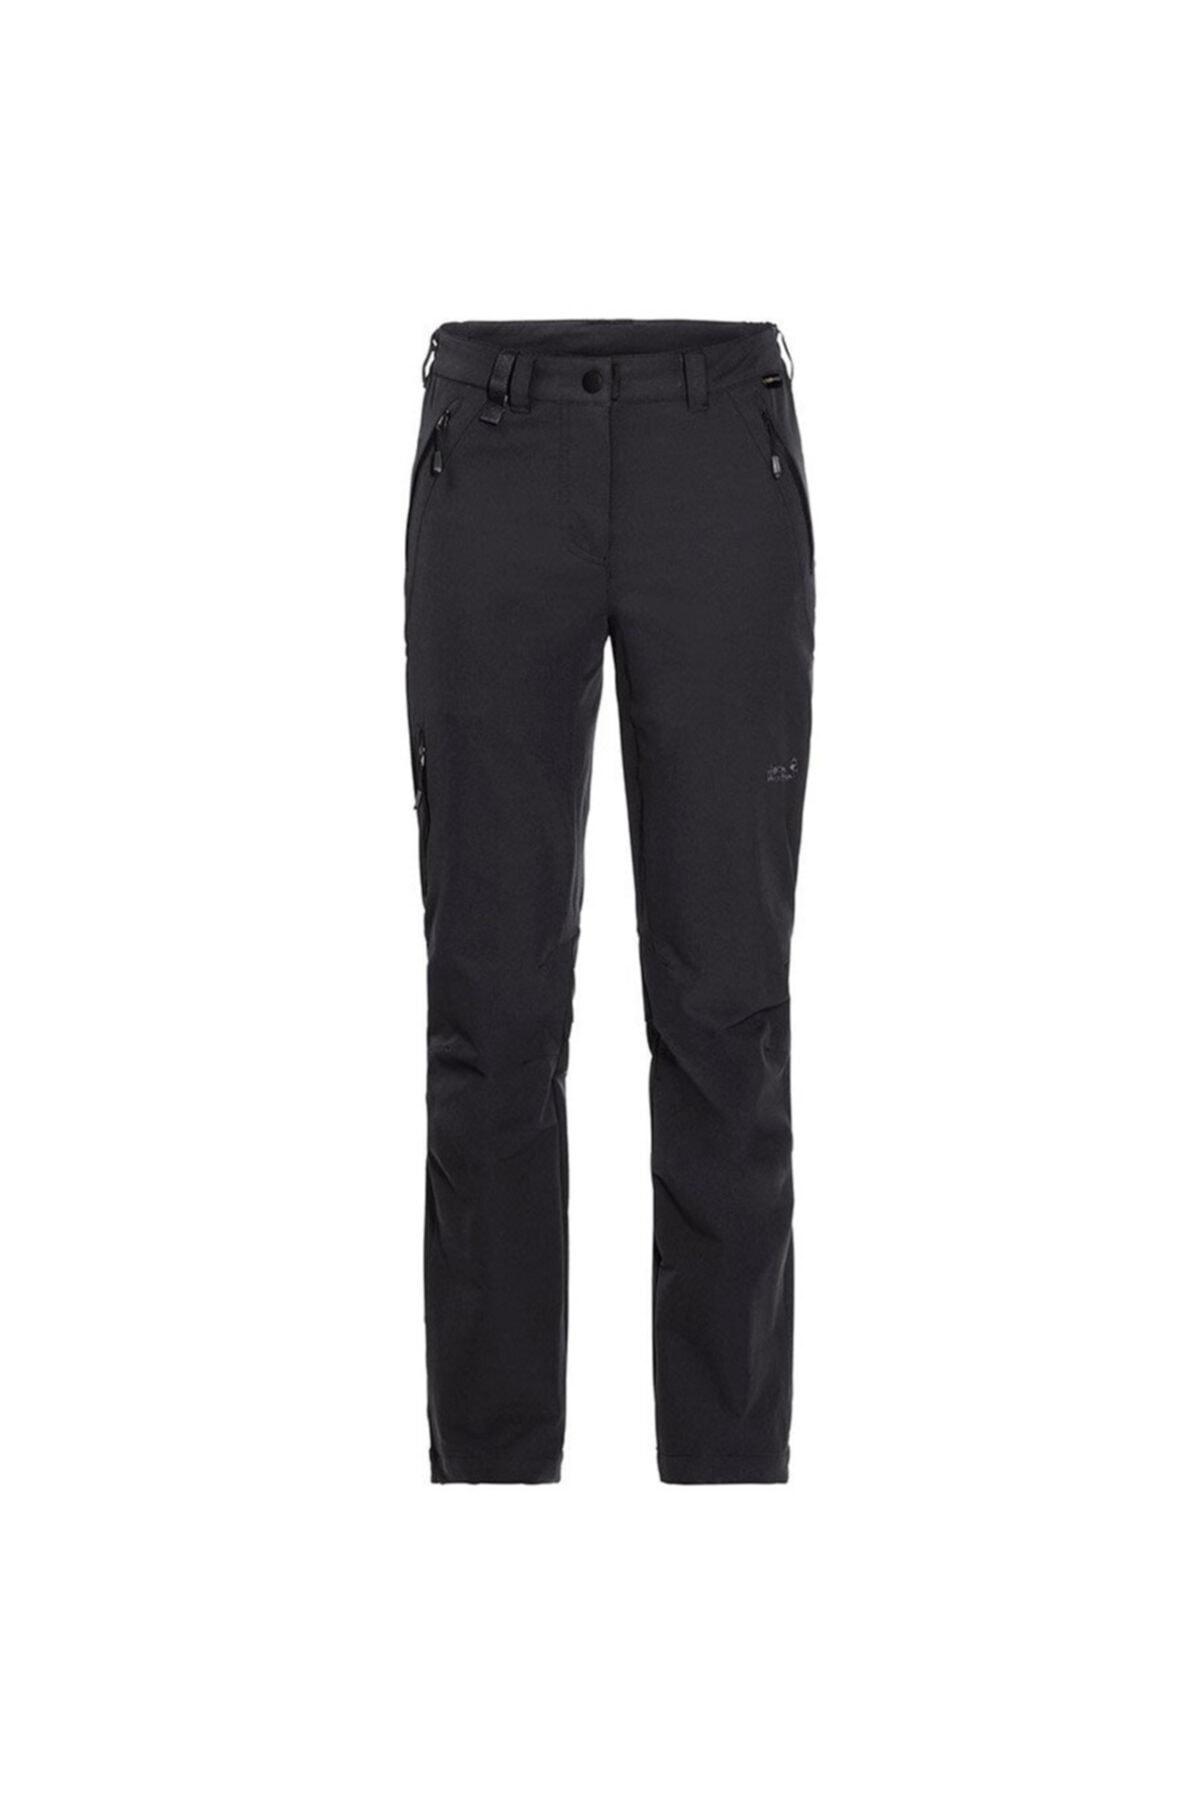 Jack Wolfskin Kadın Siyah Activate XT  Pantolon 1